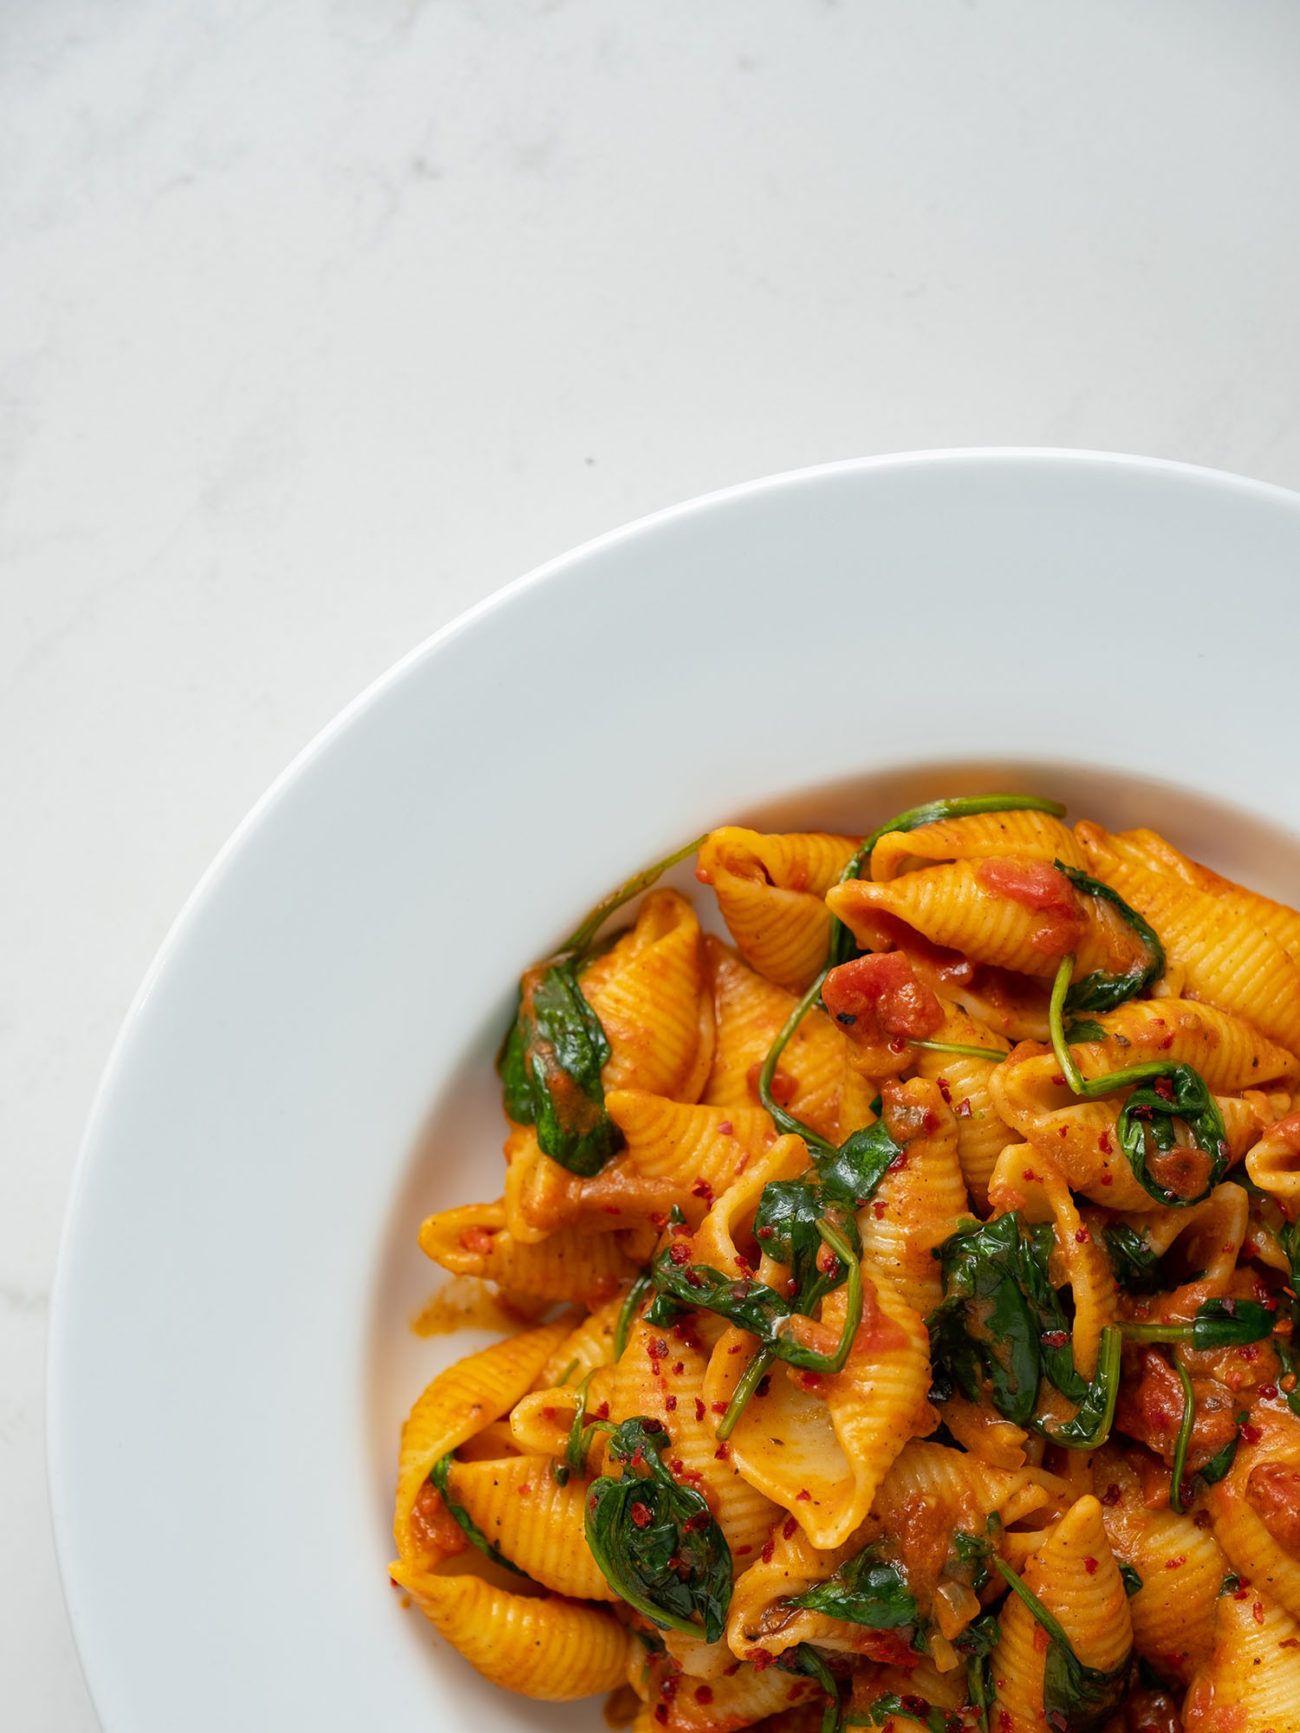 Rezept_Pasta mit Tomaten-Spinat-Sauce, Teller, Chiliflakes, Soße